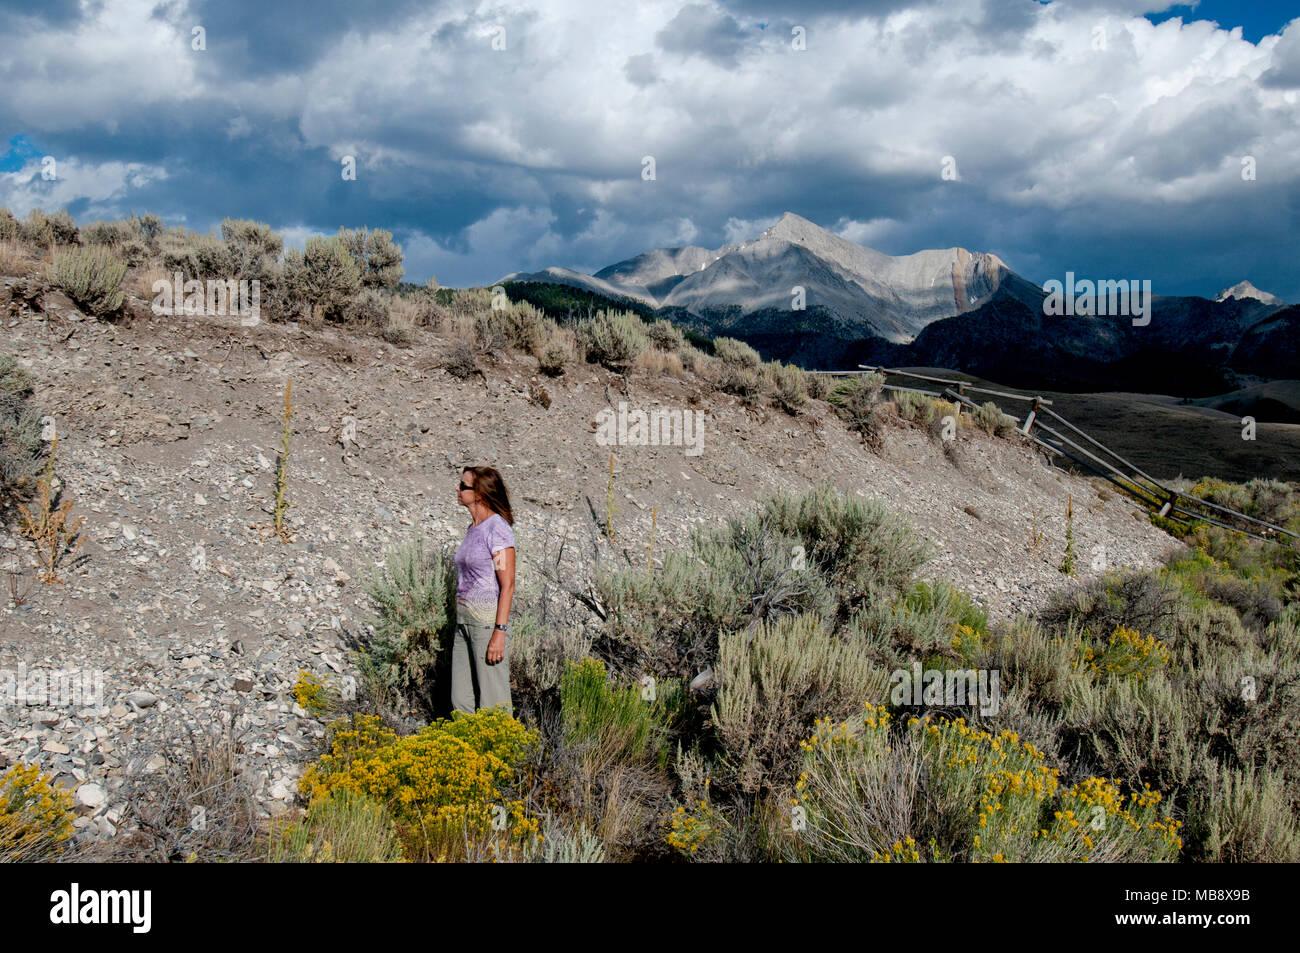 Mount Borah 21-mile-long earthquake scarp with Mount Borah in the background  (MR) - Stock Image